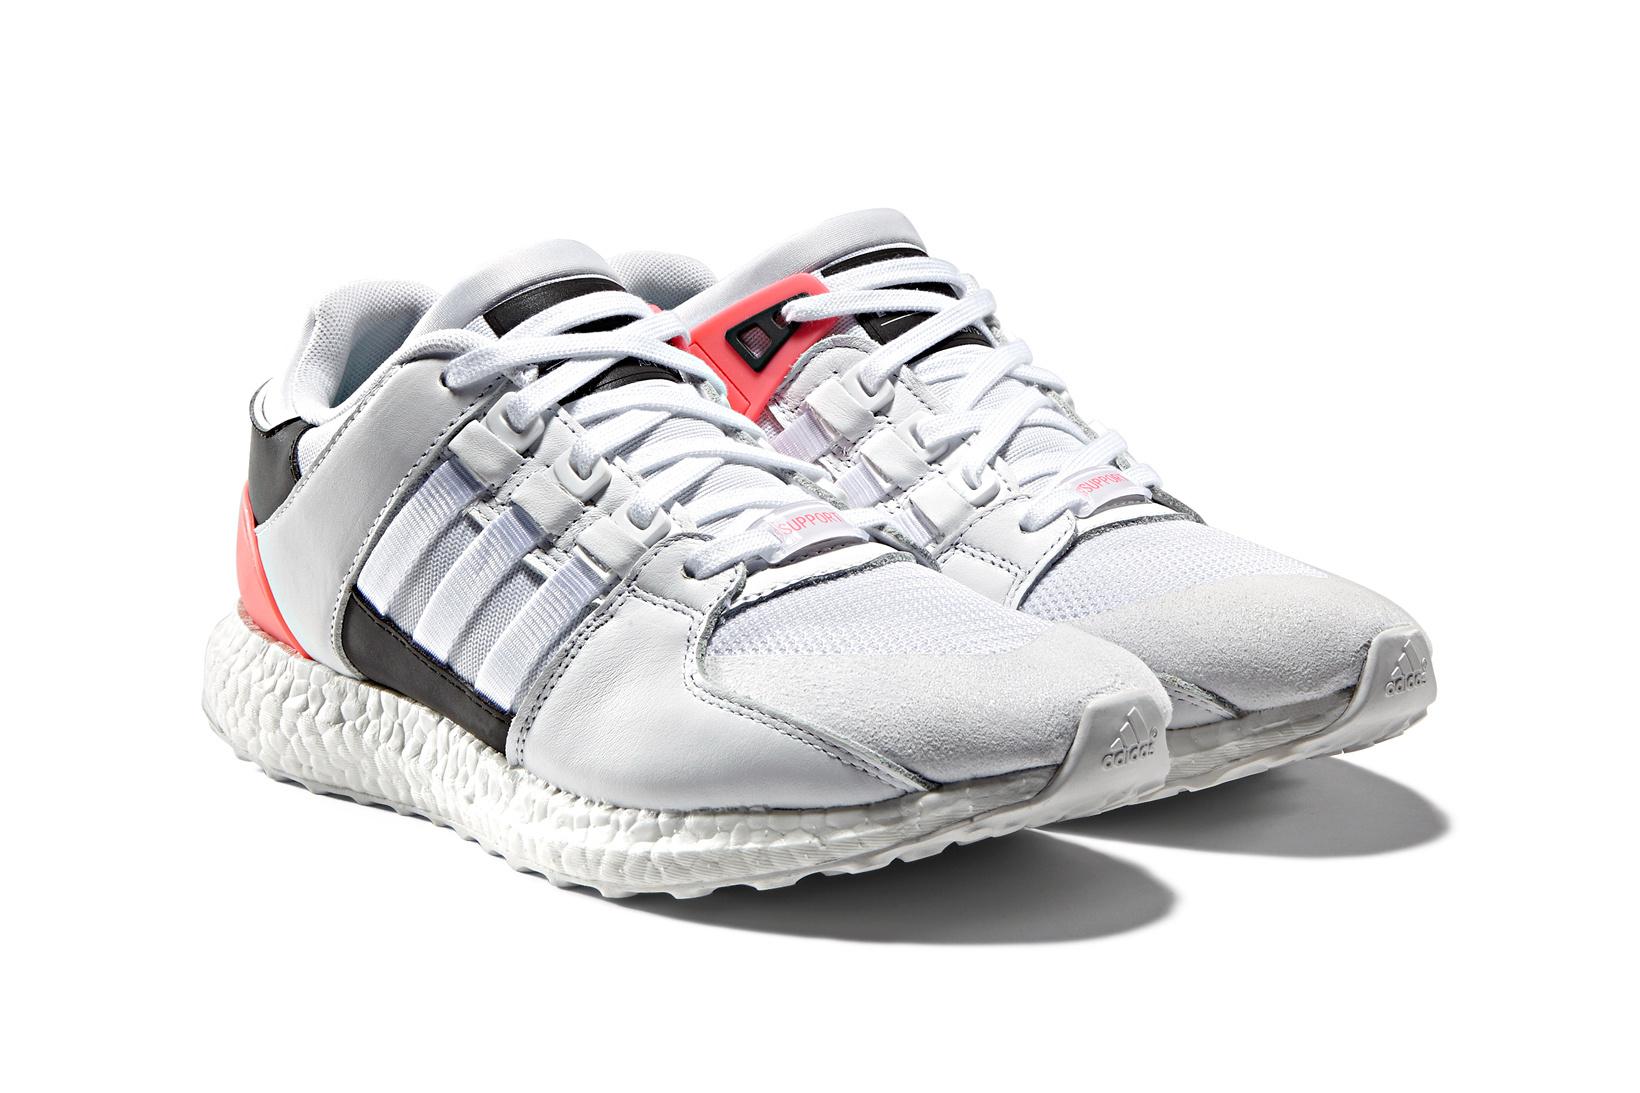 adidas-originals-eqt-support-ultra-white-turbo-red-02